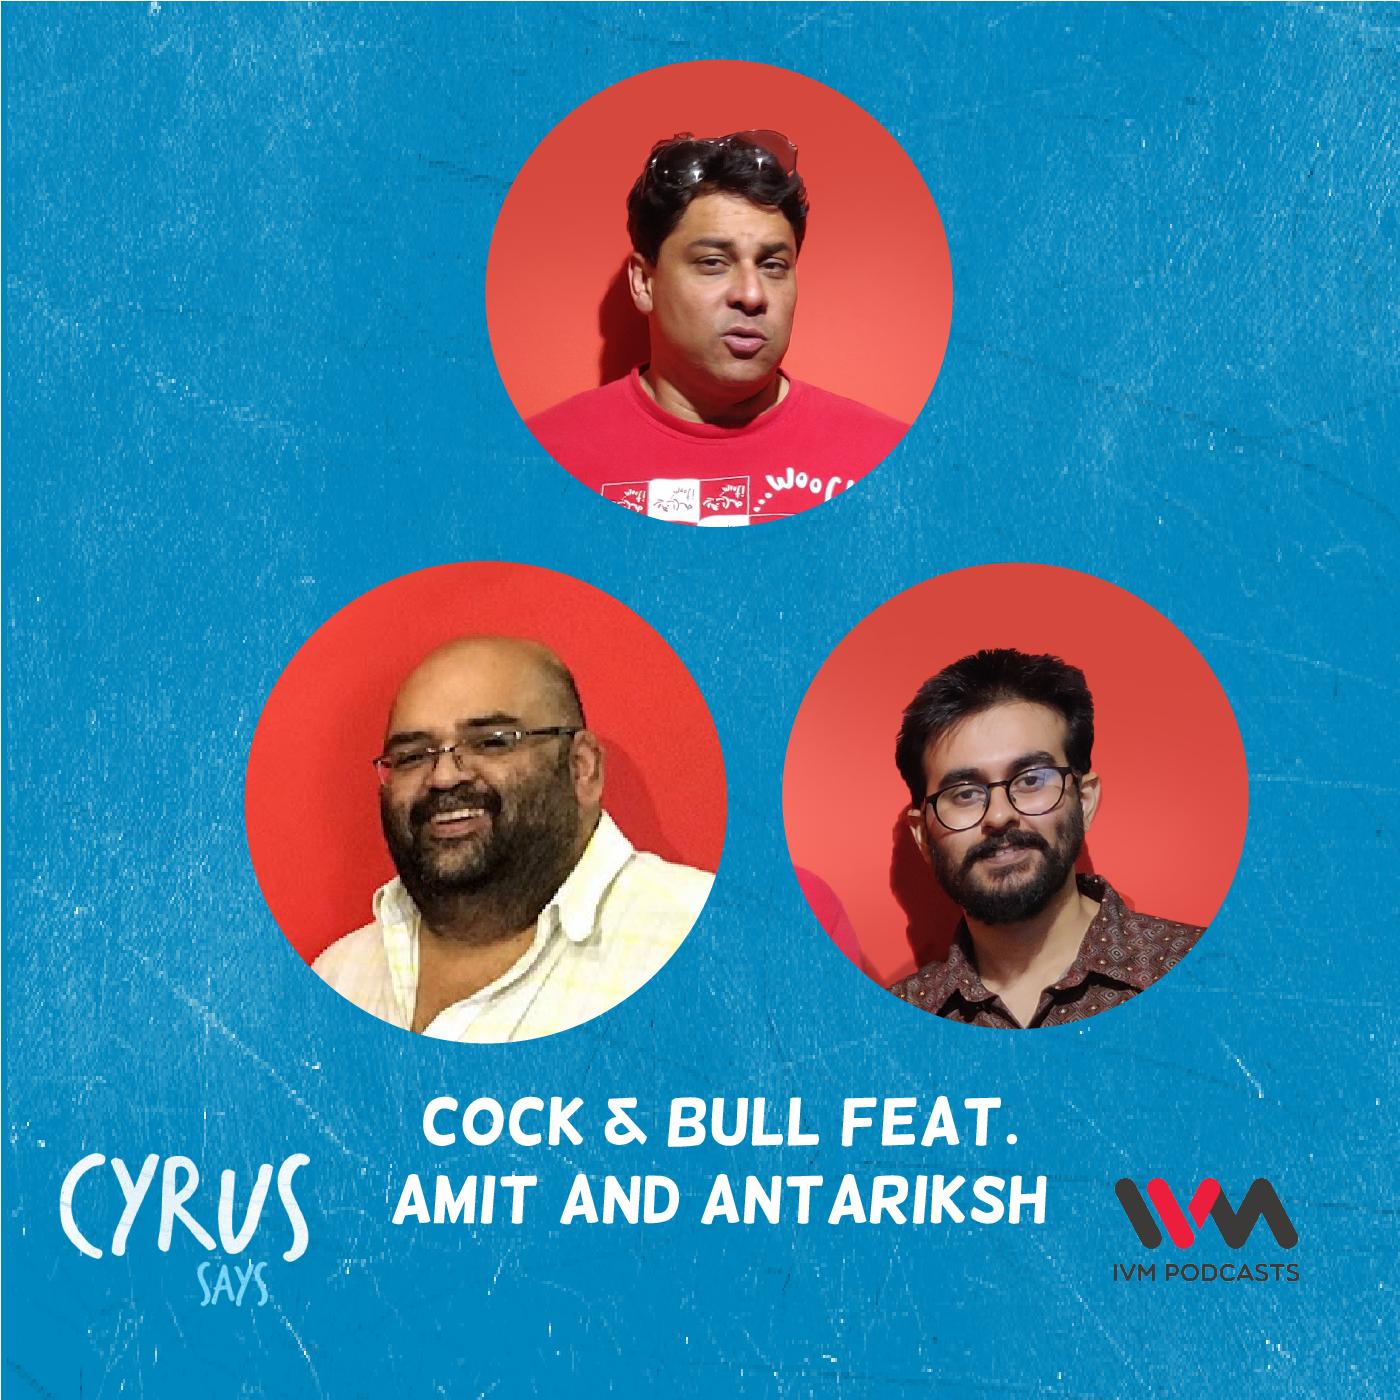 Ep. 638: Cock & Bull feat. Amit and Antariksh